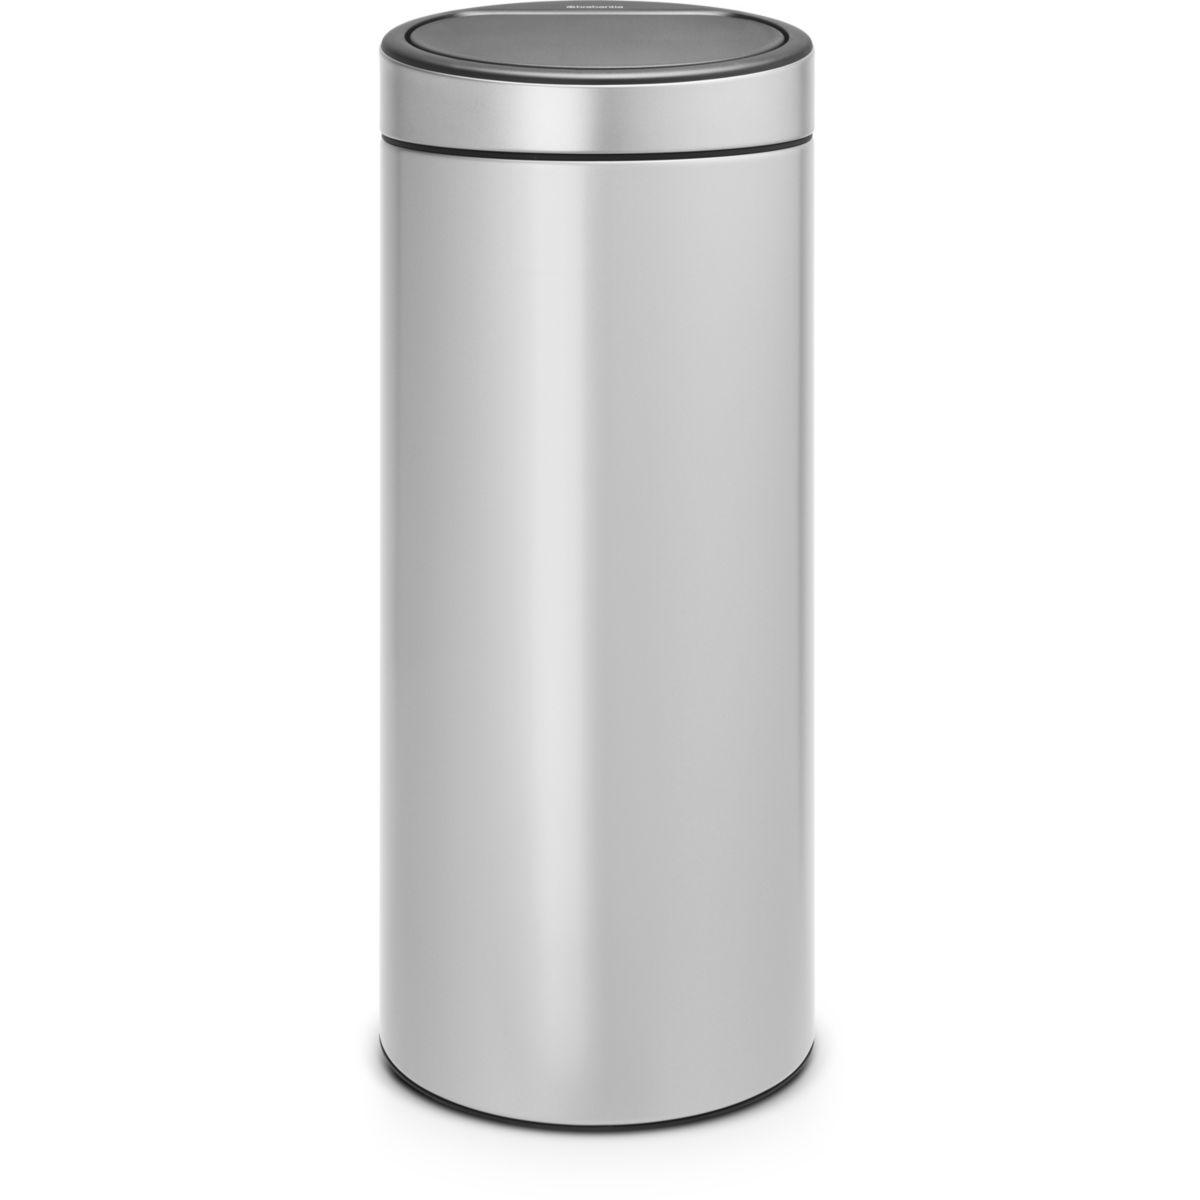 Poubelle manuelle BRABANTIA Touch Bin new 30L metallic grey